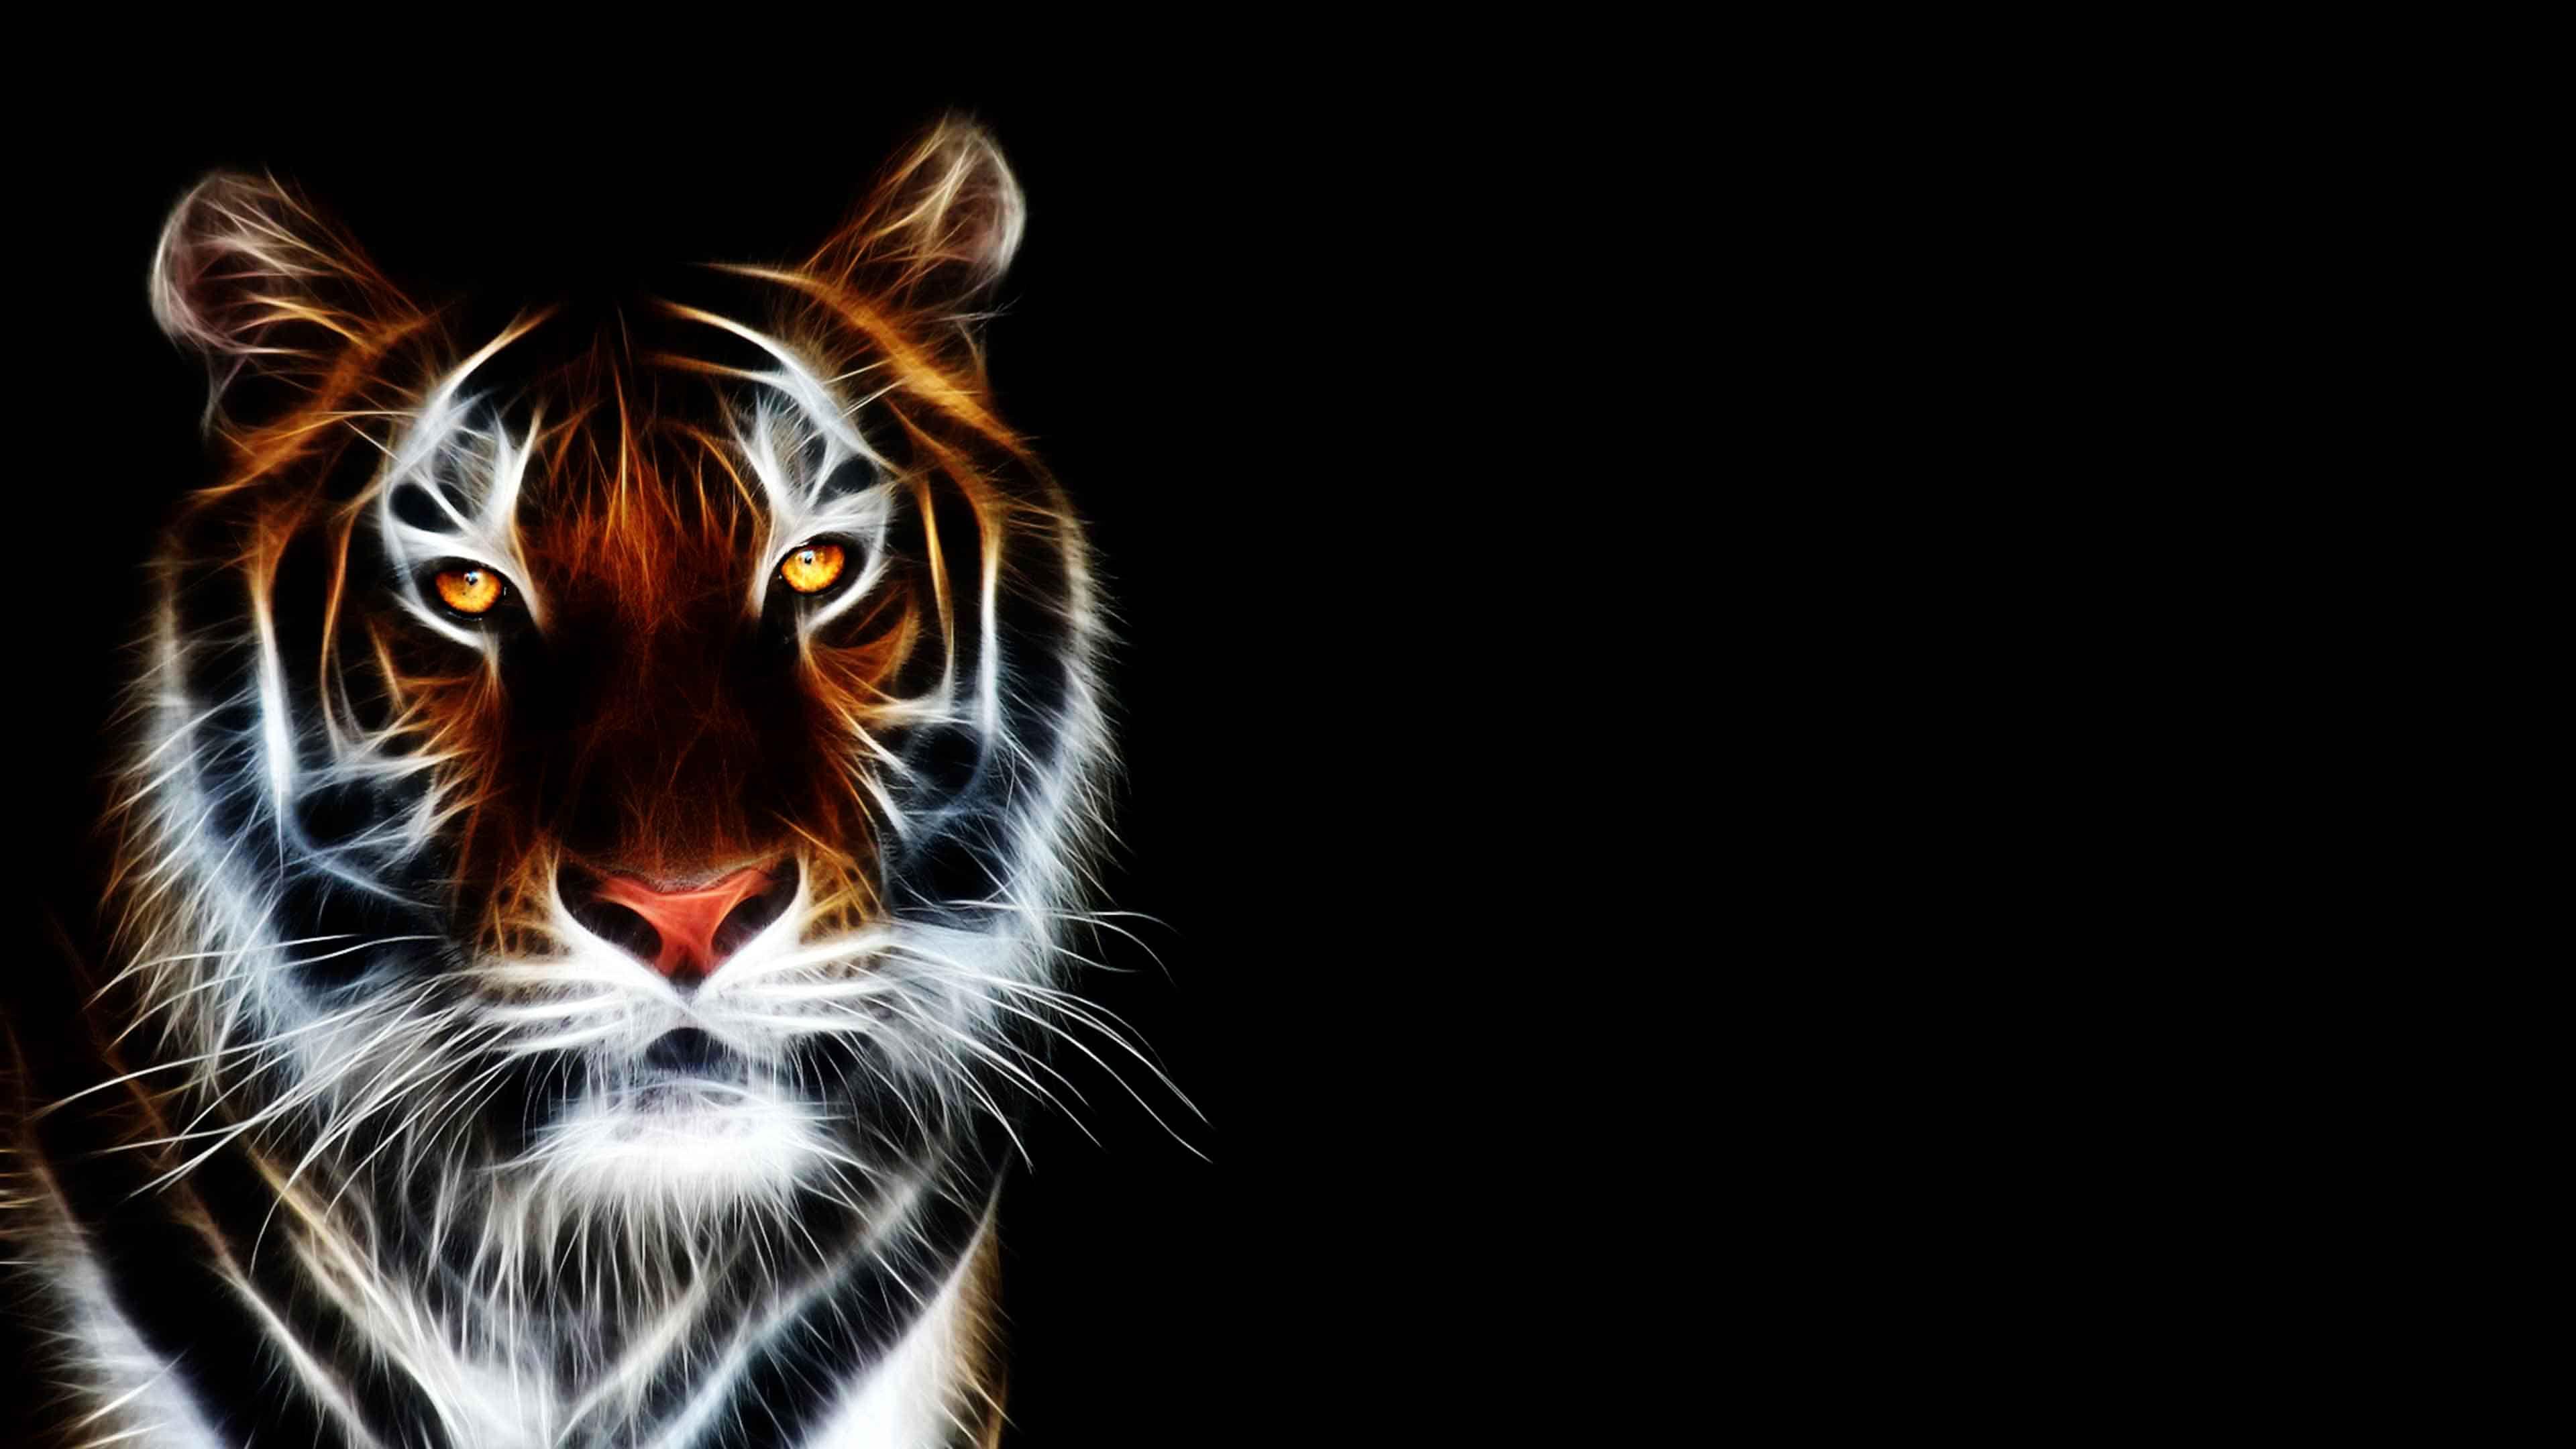 3D Animated Tiger Wallpaper Tiger images, Tiger art